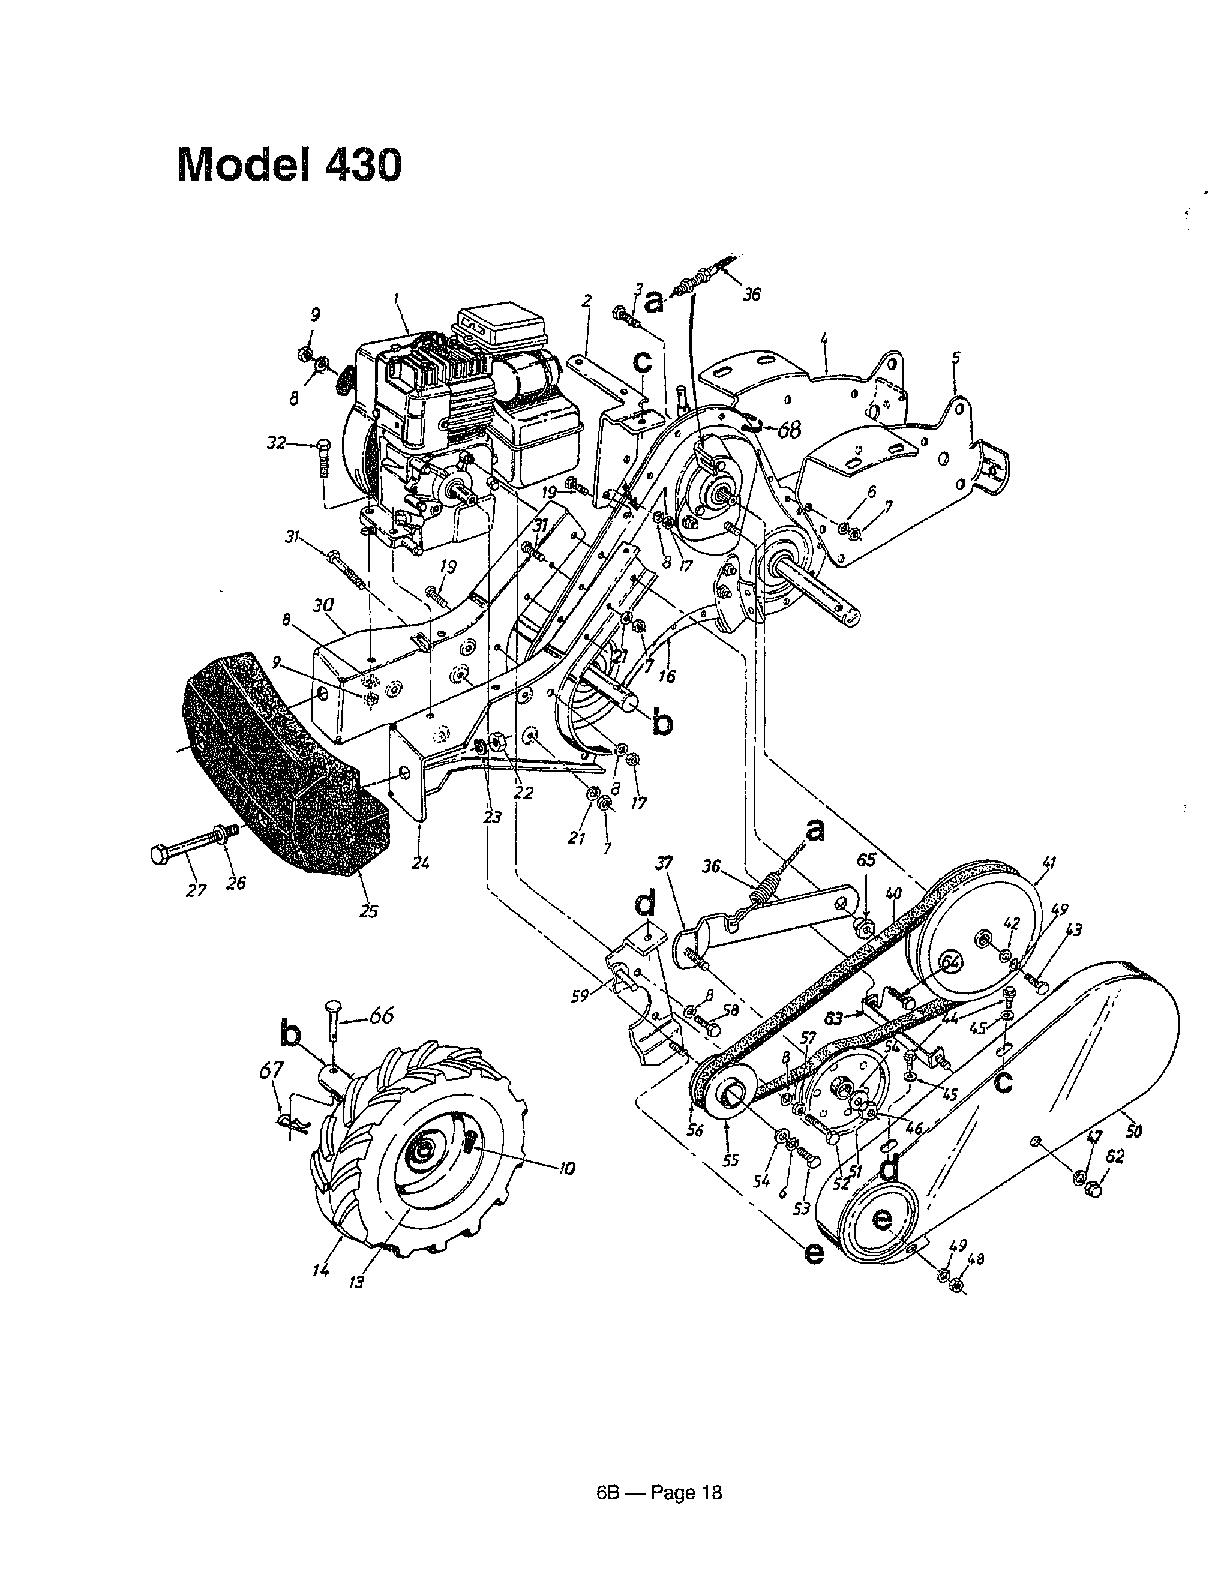 hight resolution of mtd 215 430 000 rear tine tiller page 6 diagram